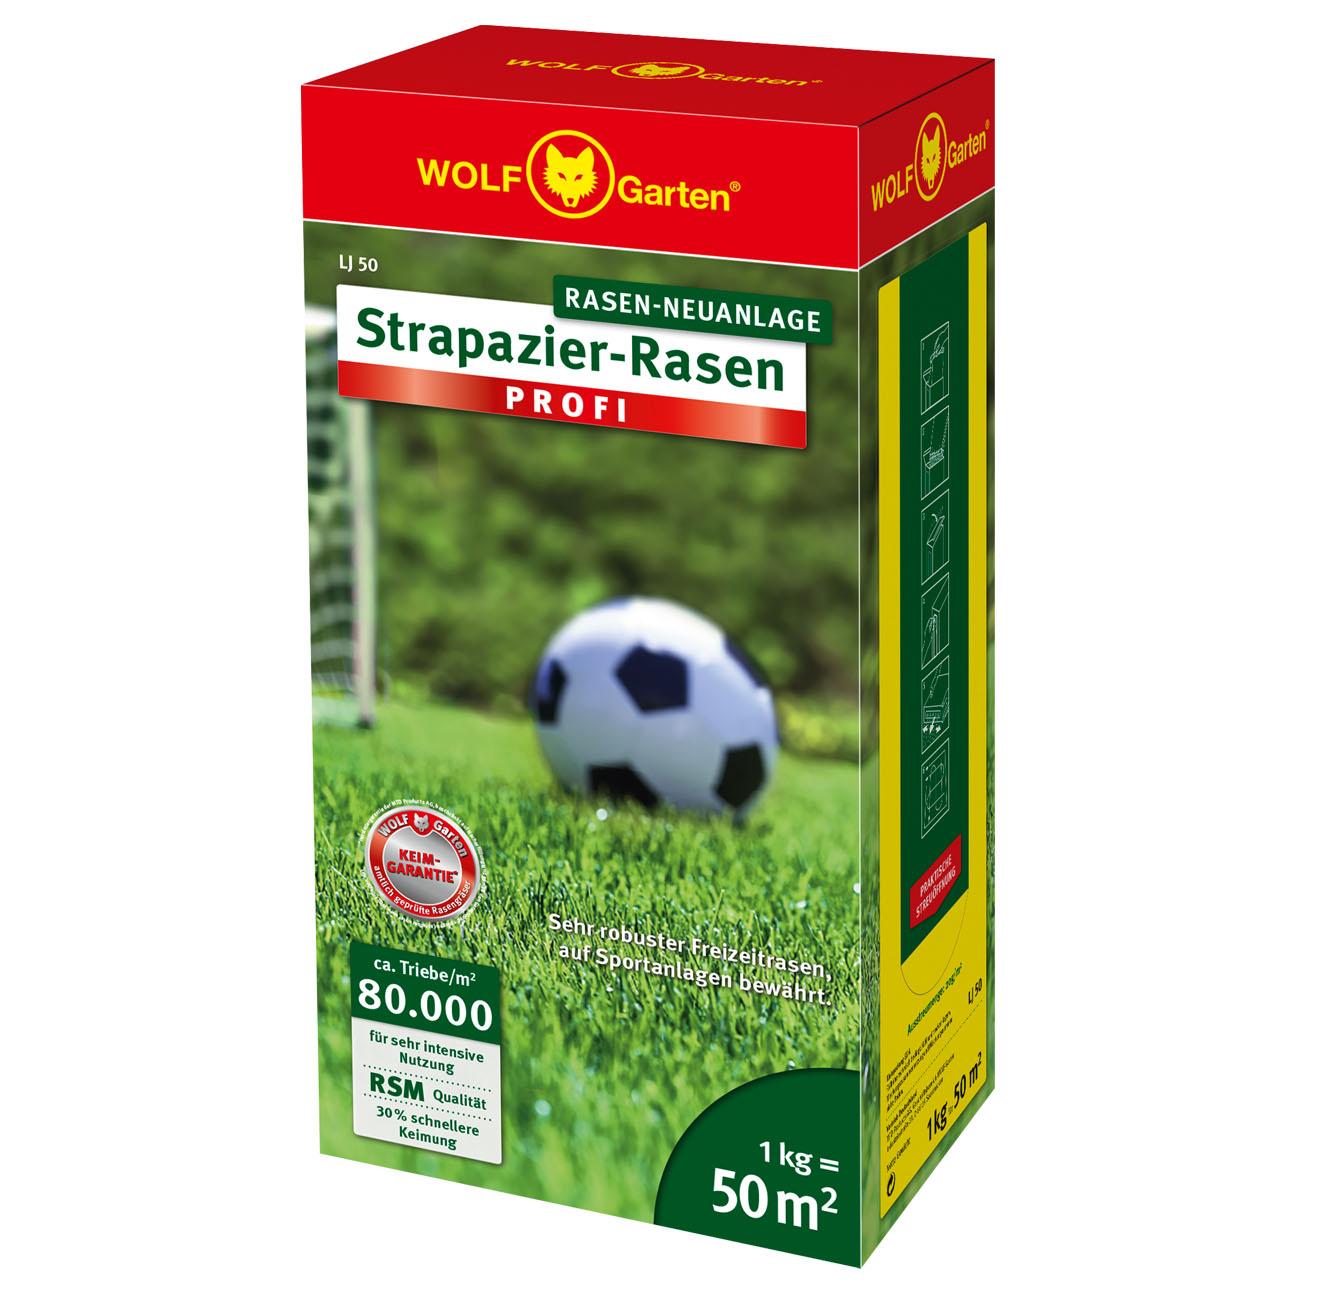 Premium Garten Strapazier-Rasen PROFI 2,5kg